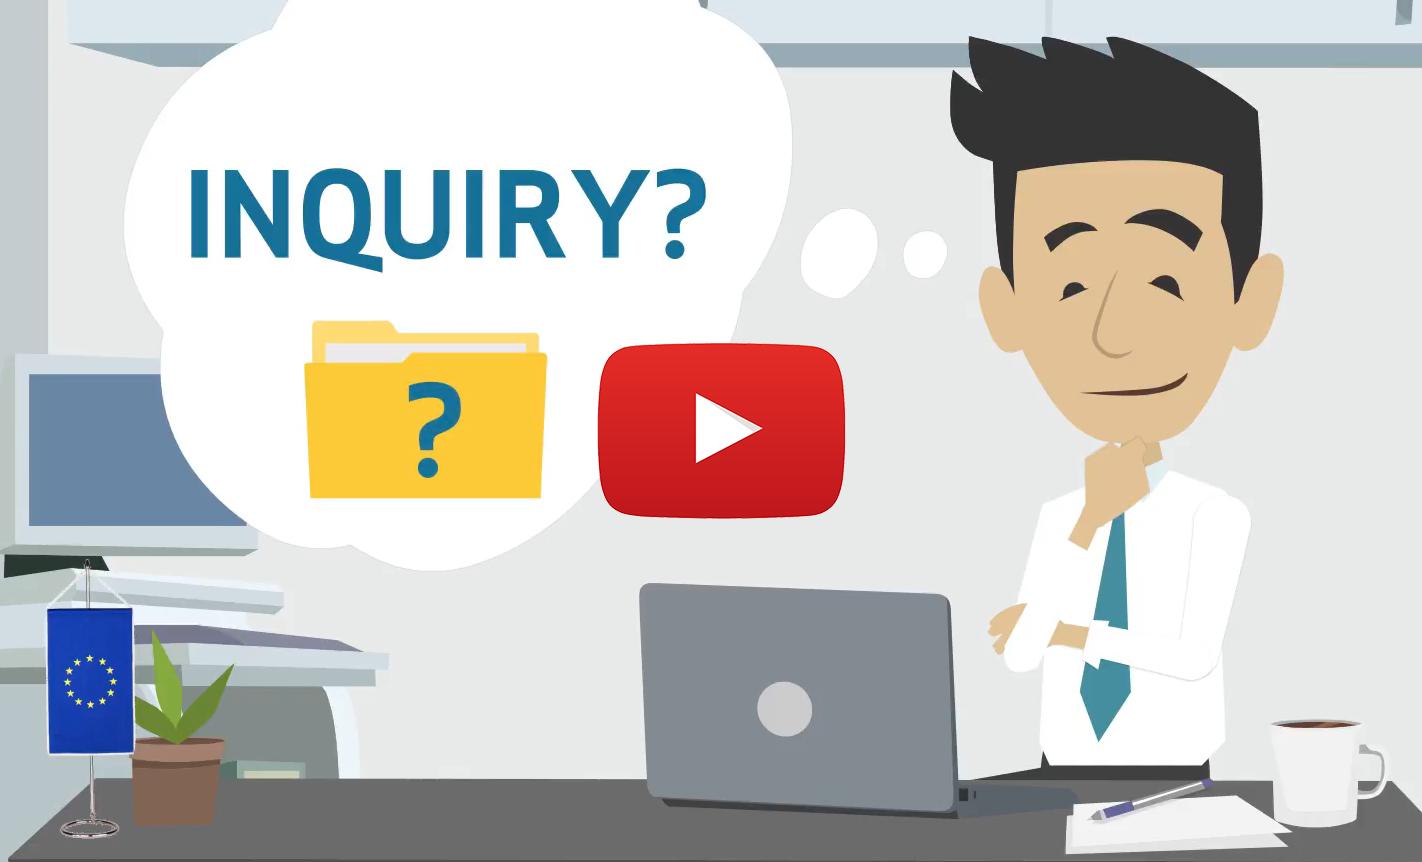 Inquiry animation